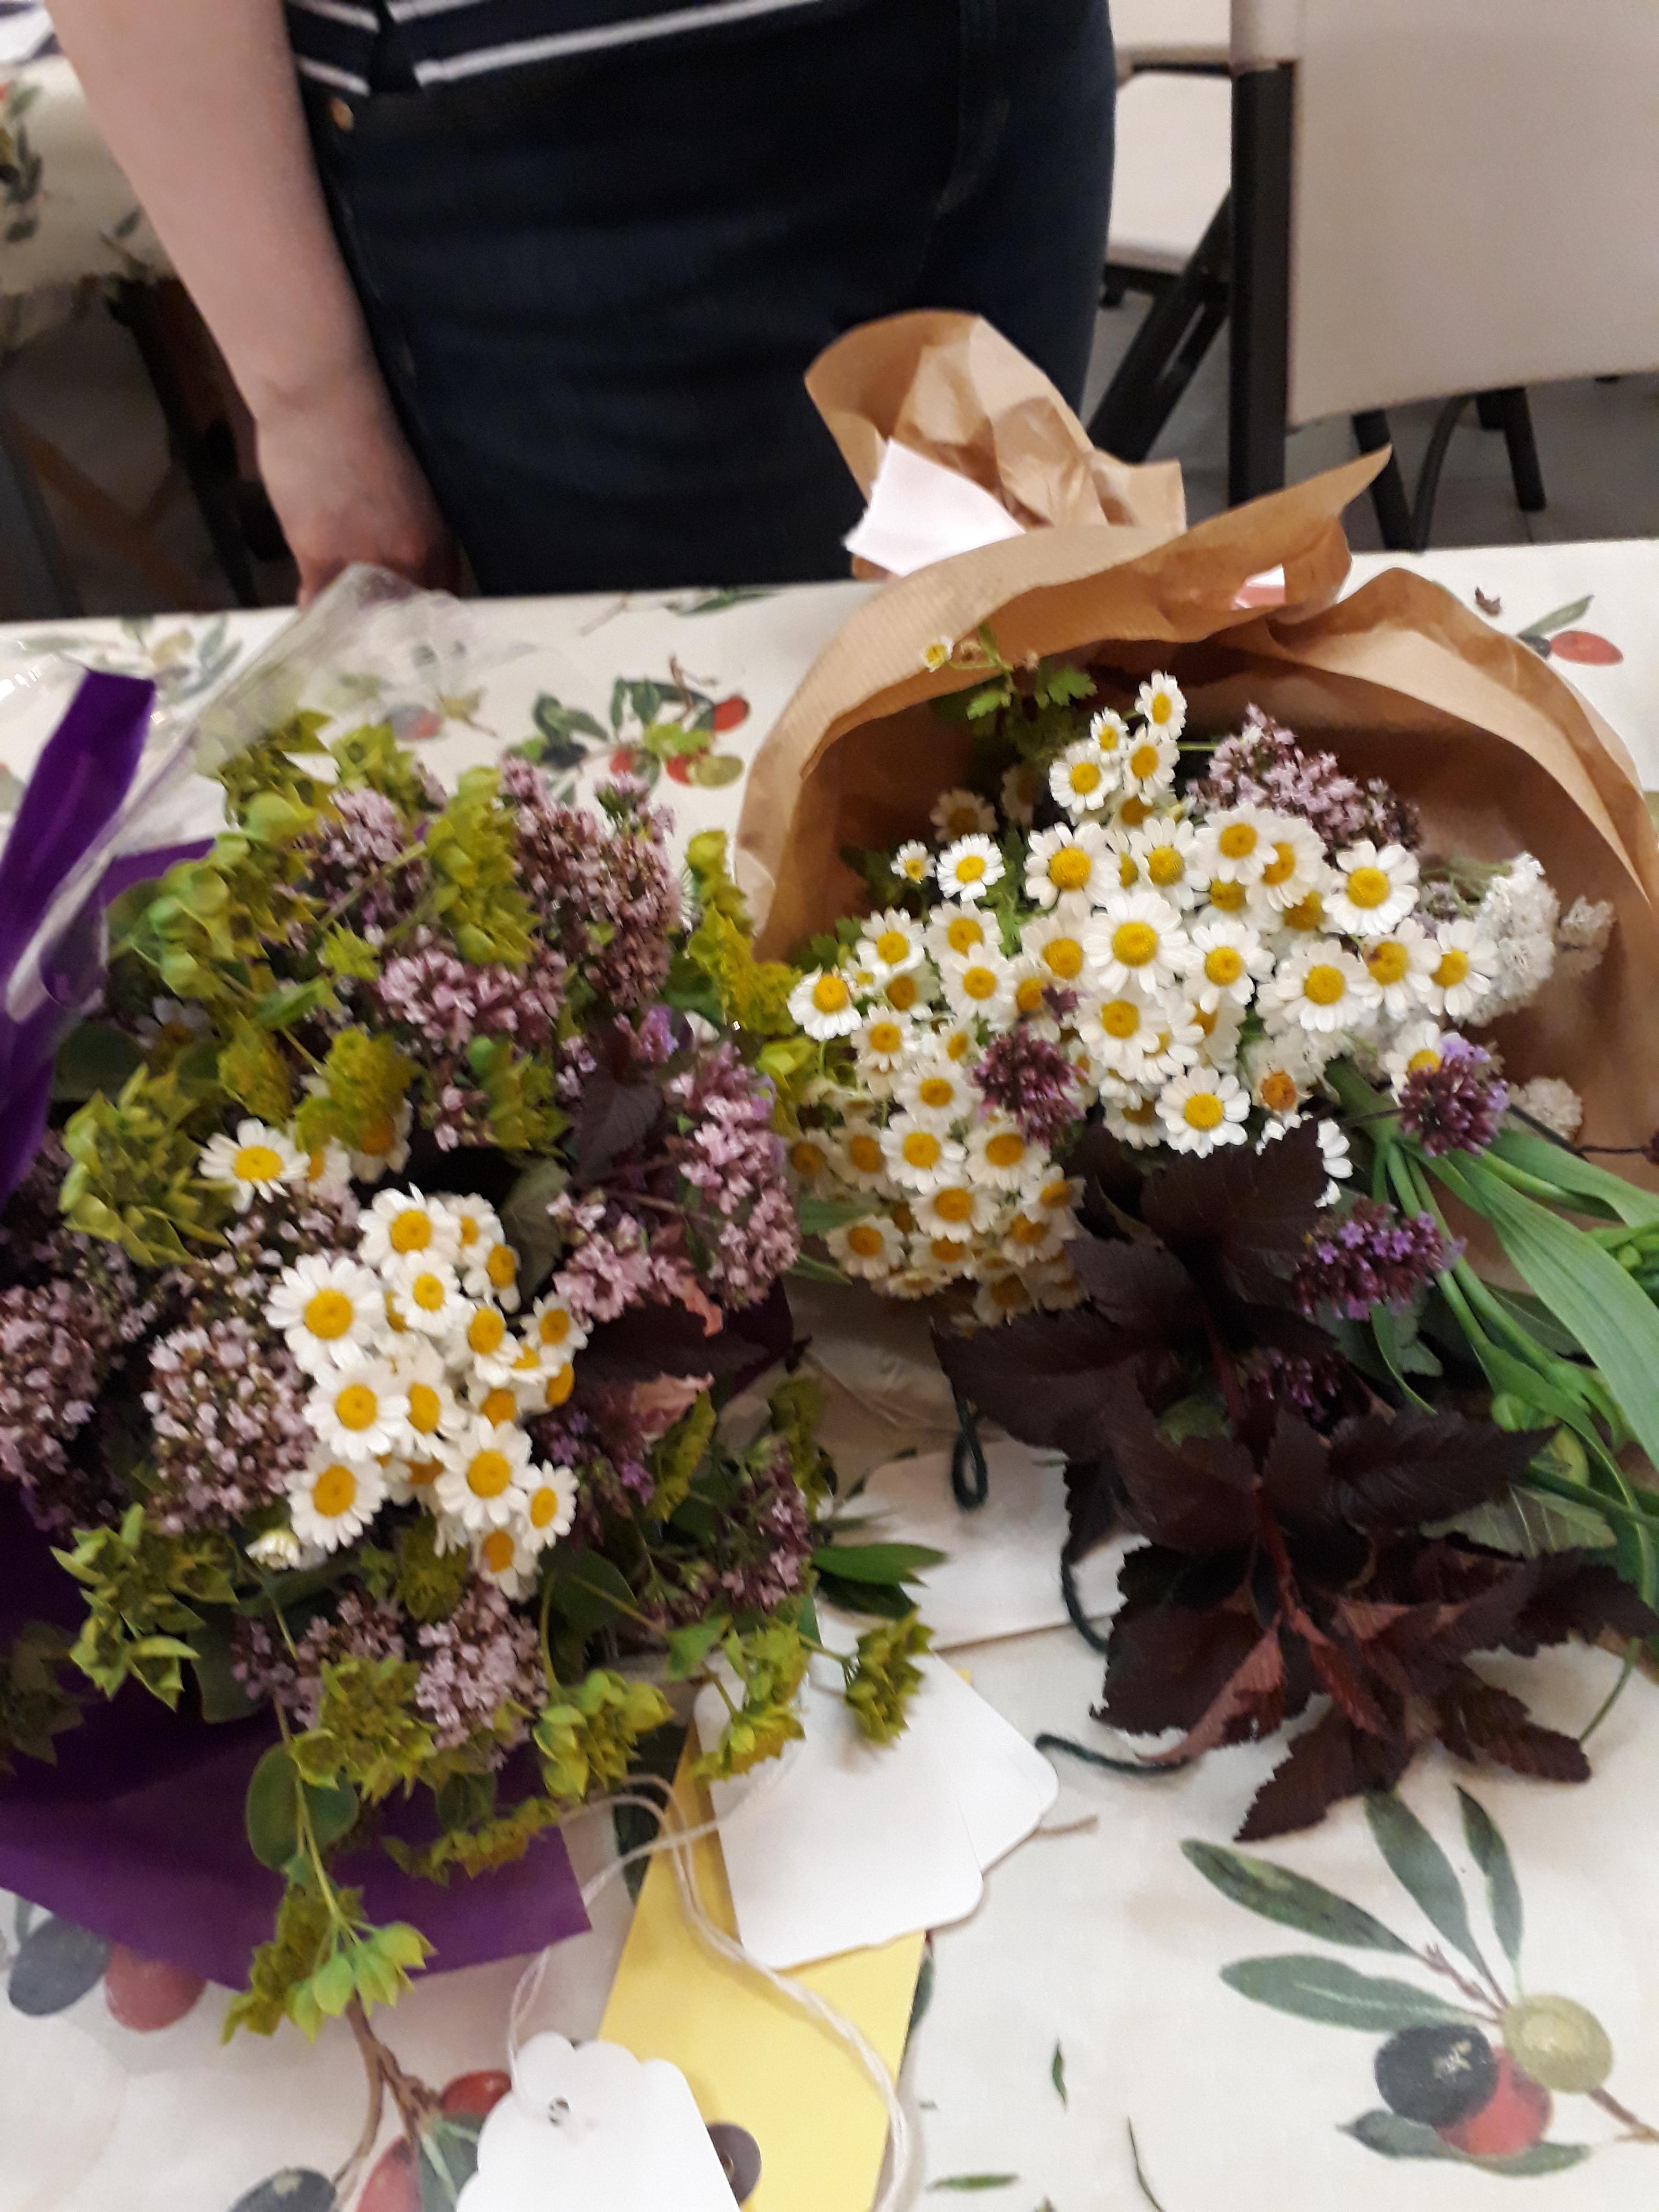 Make a posy of flowers de beauvoir wi make a posy of flowers izmirmasajfo Gallery